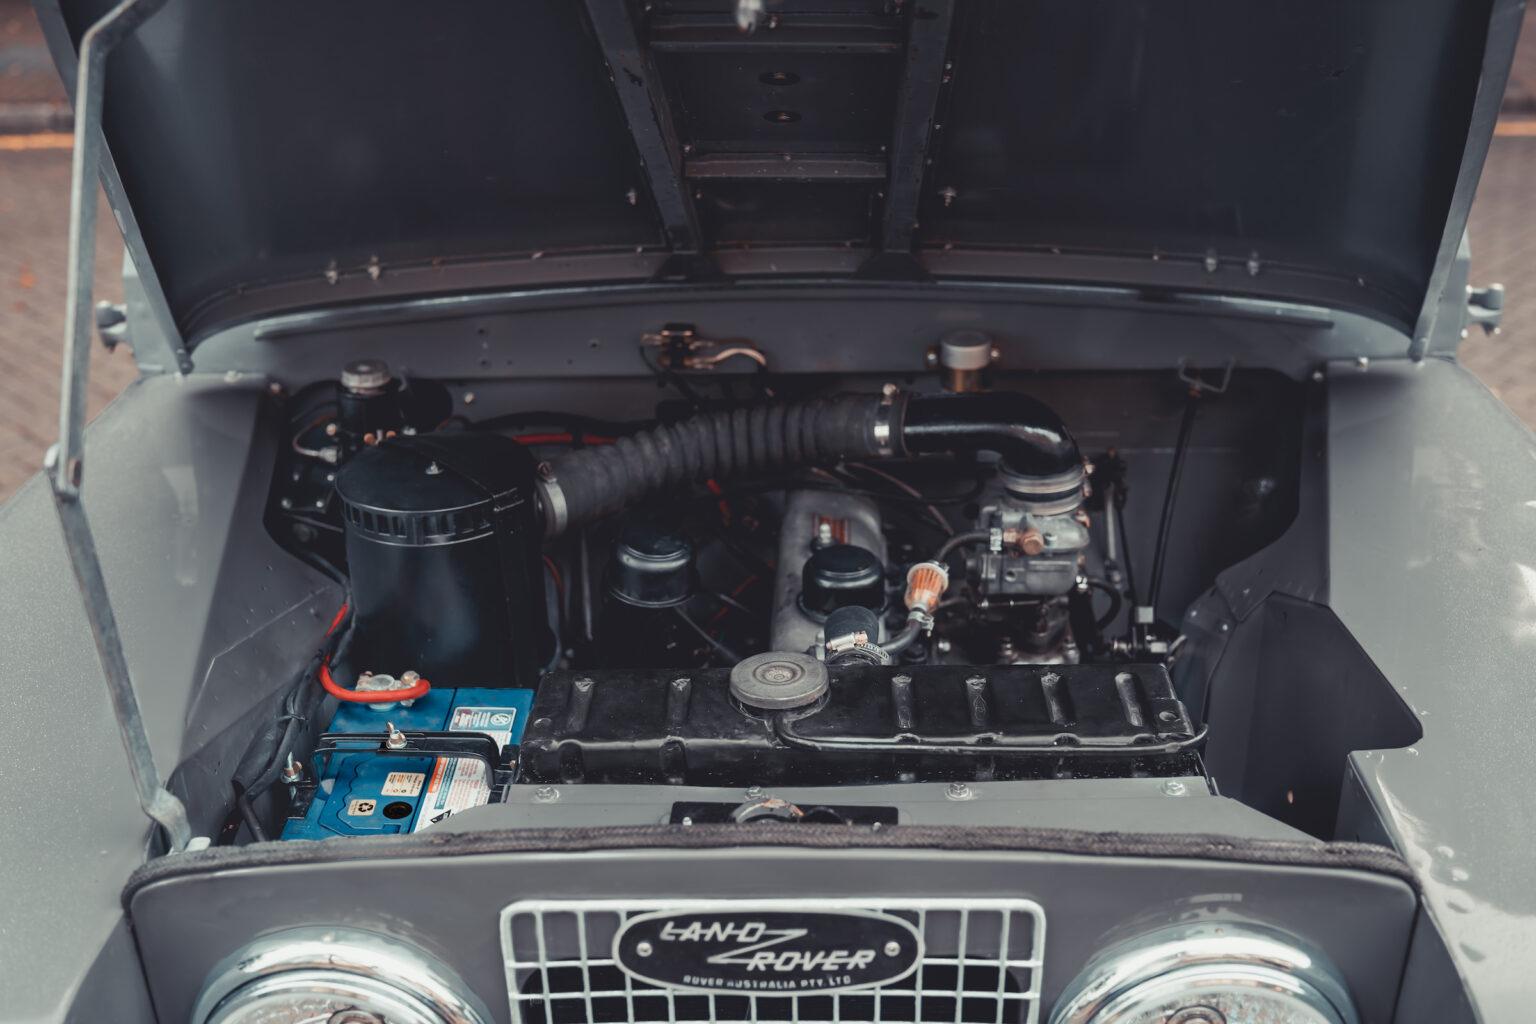 Land-Rover-Series-2A-Restoration-23-1536x1024